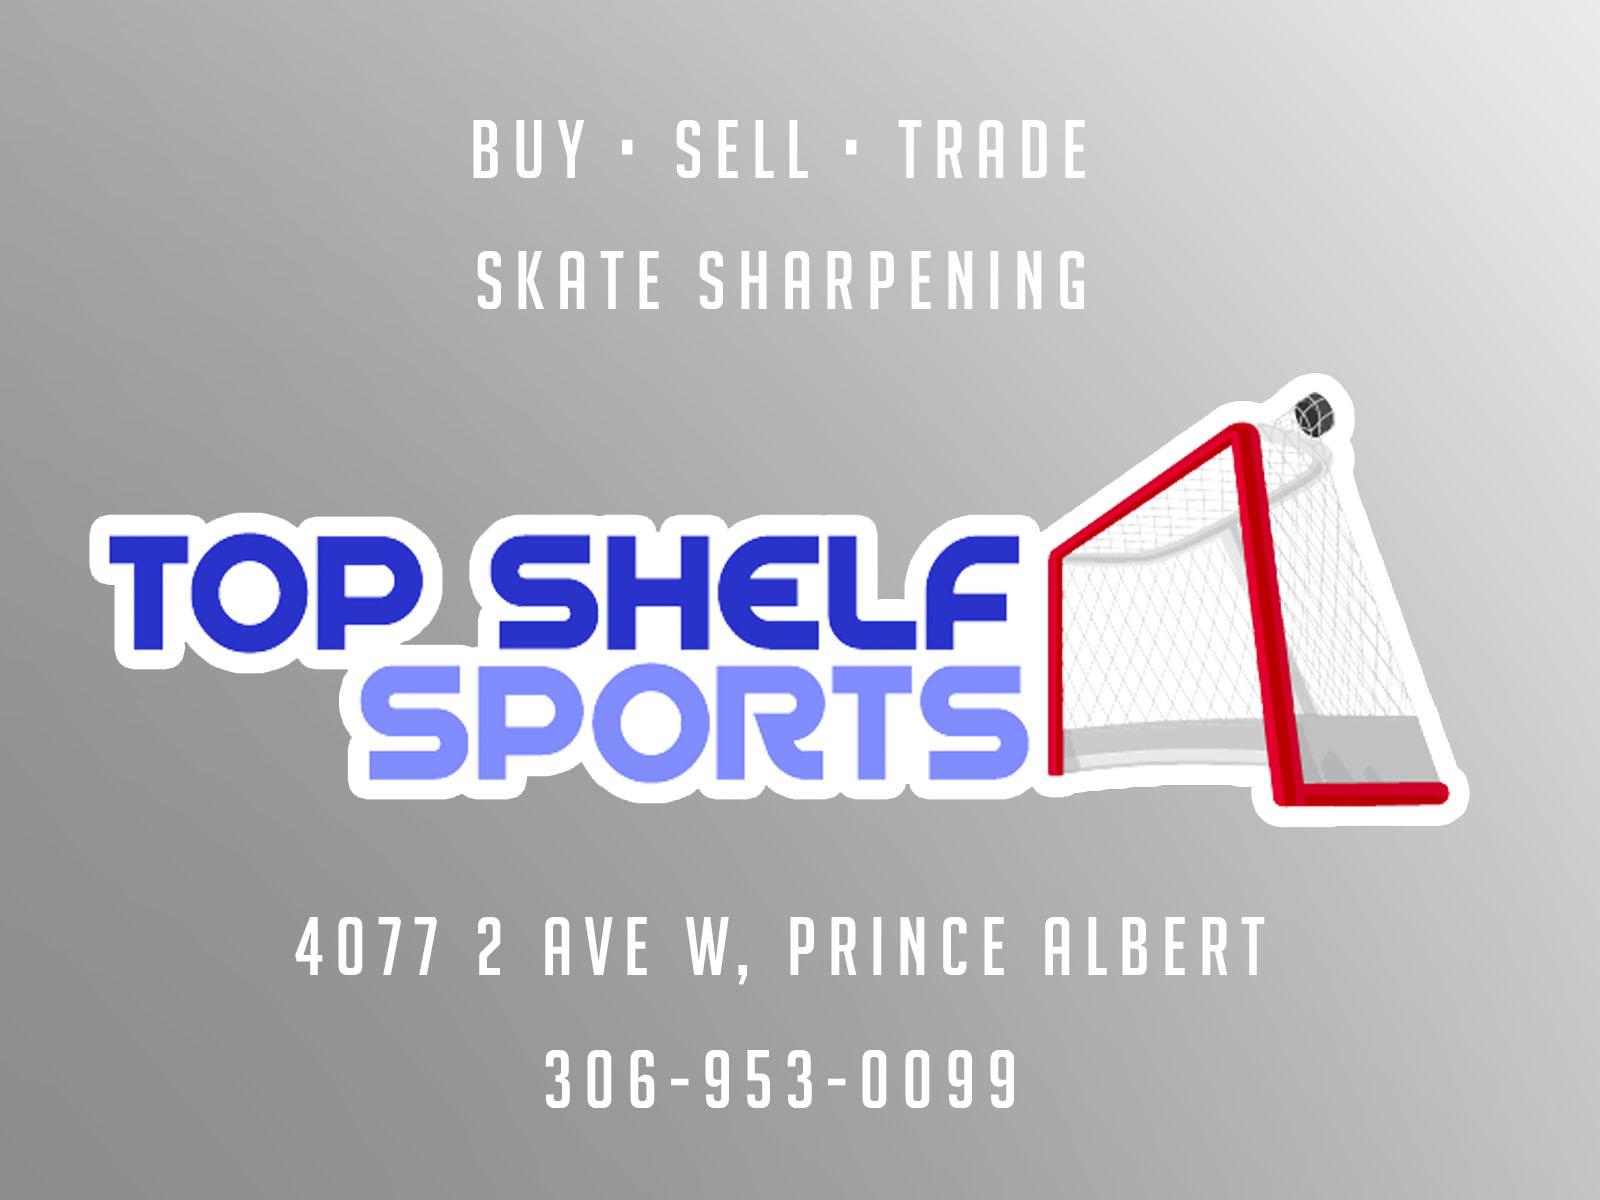 Top Shelf Sports